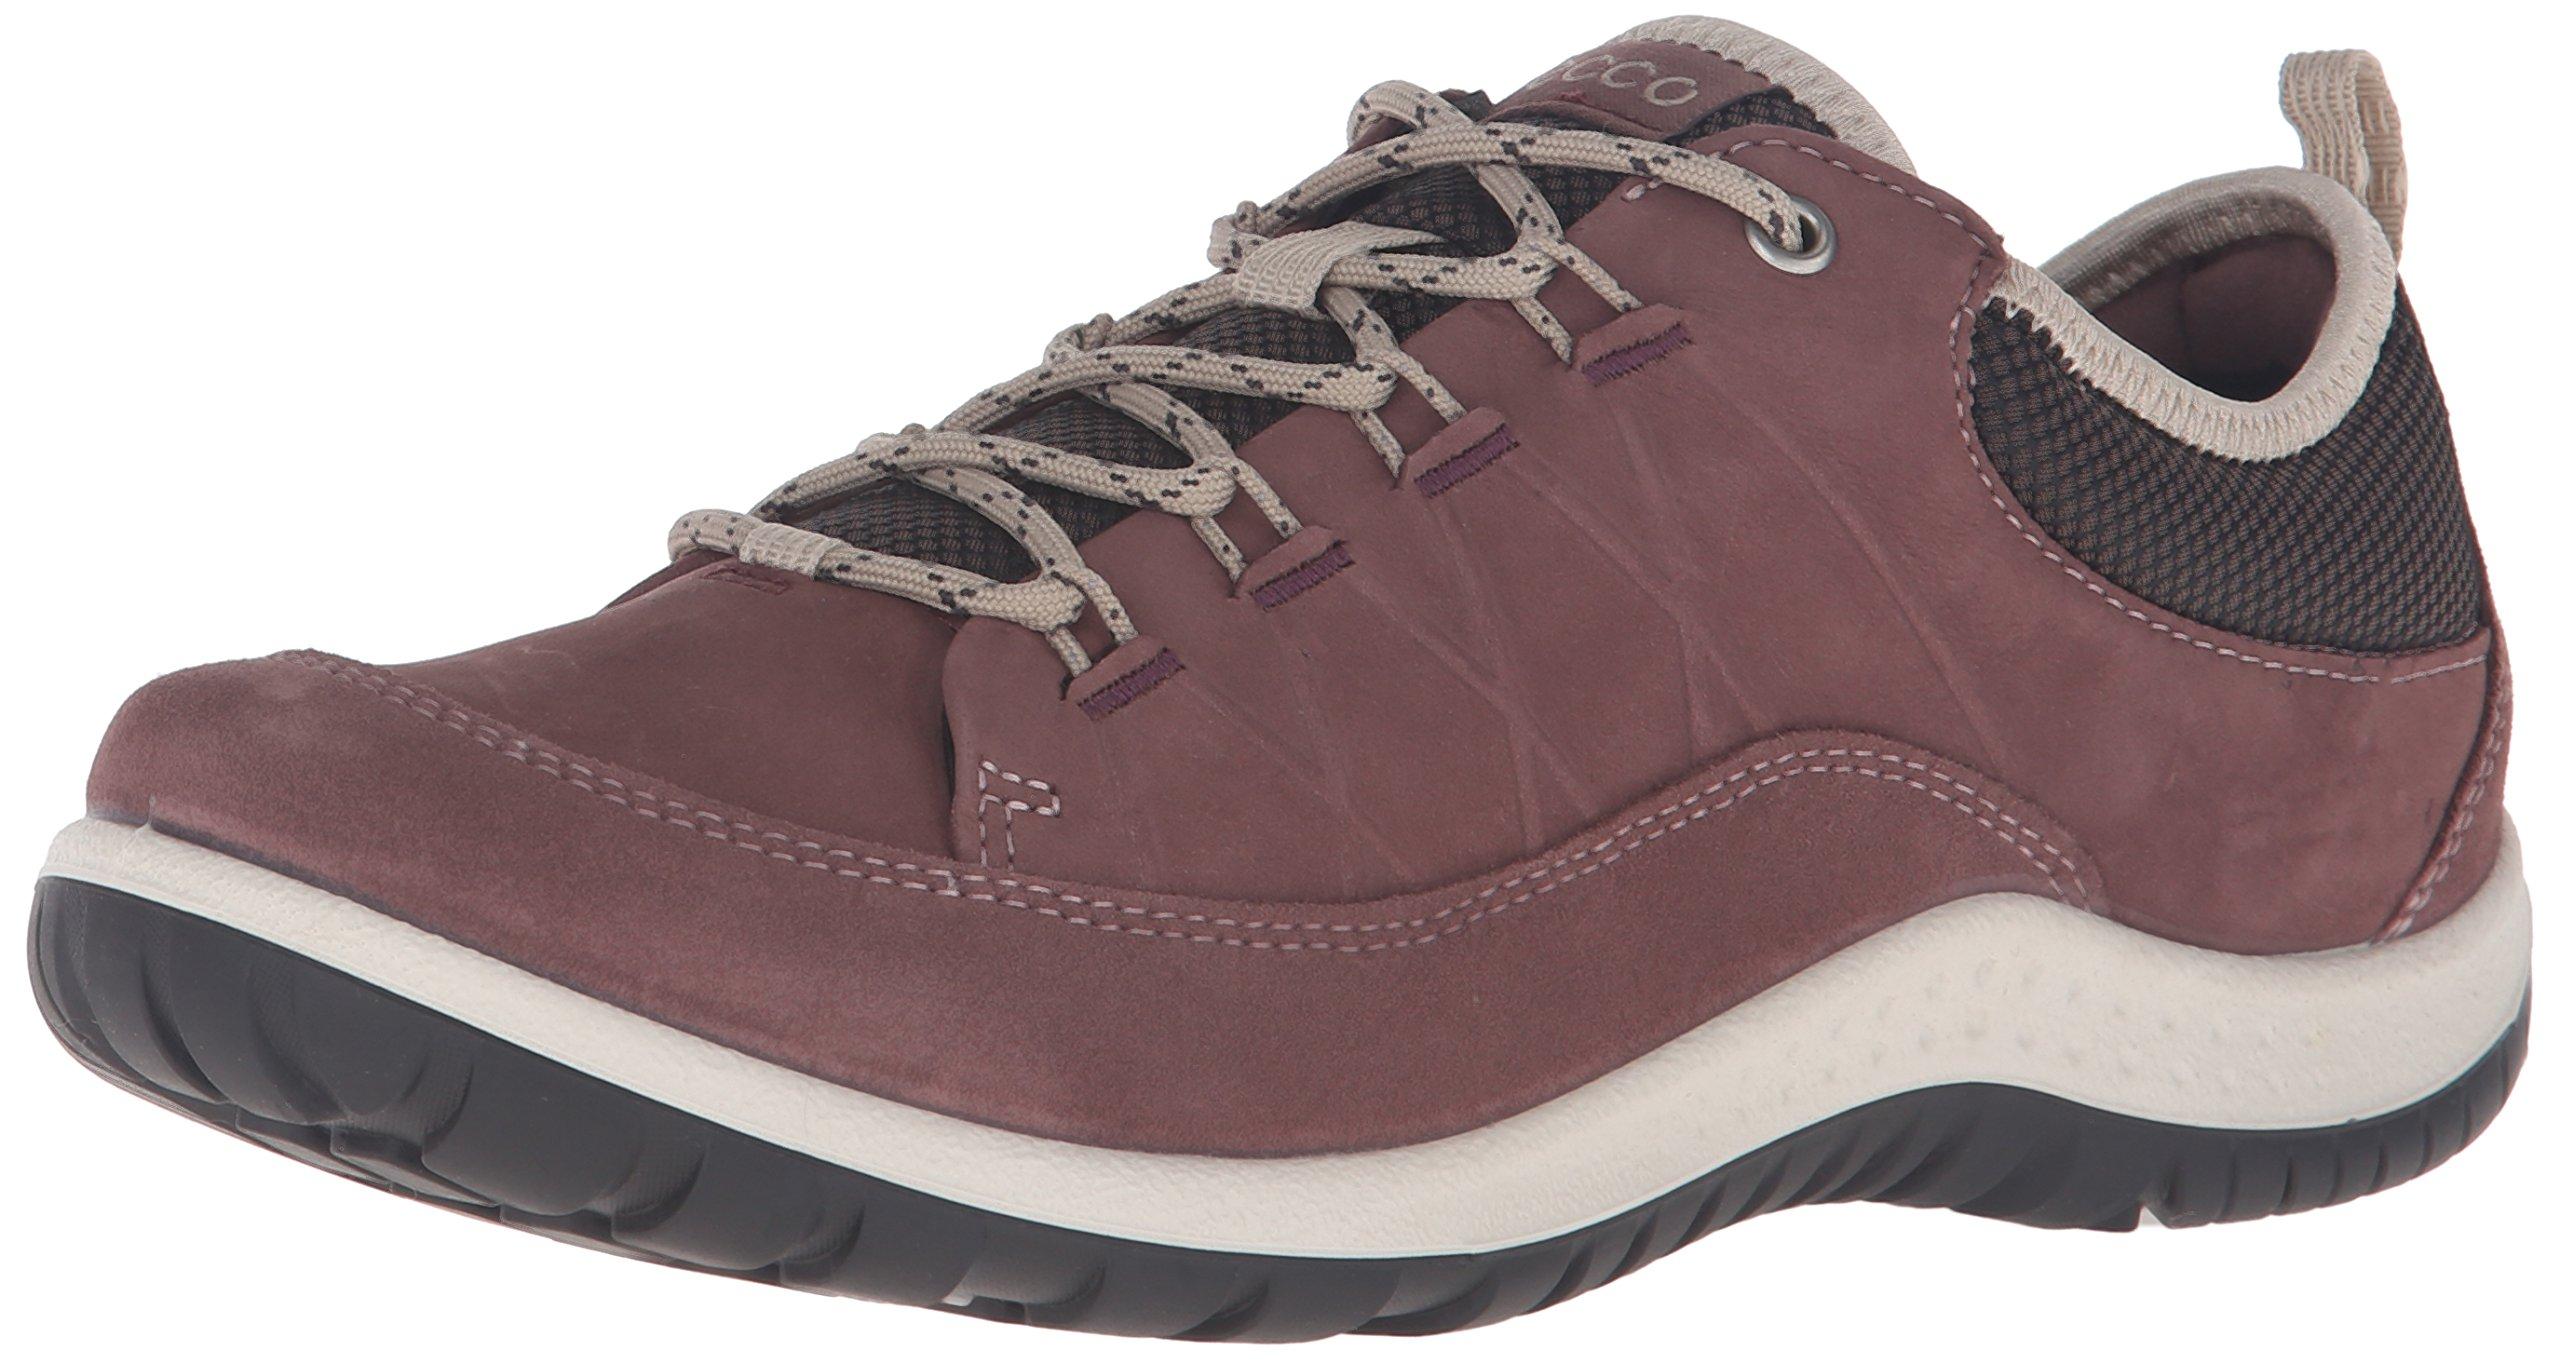 81qUXBEpIyL - ECCO Women's Aspina Multisport Outdoor Shoes